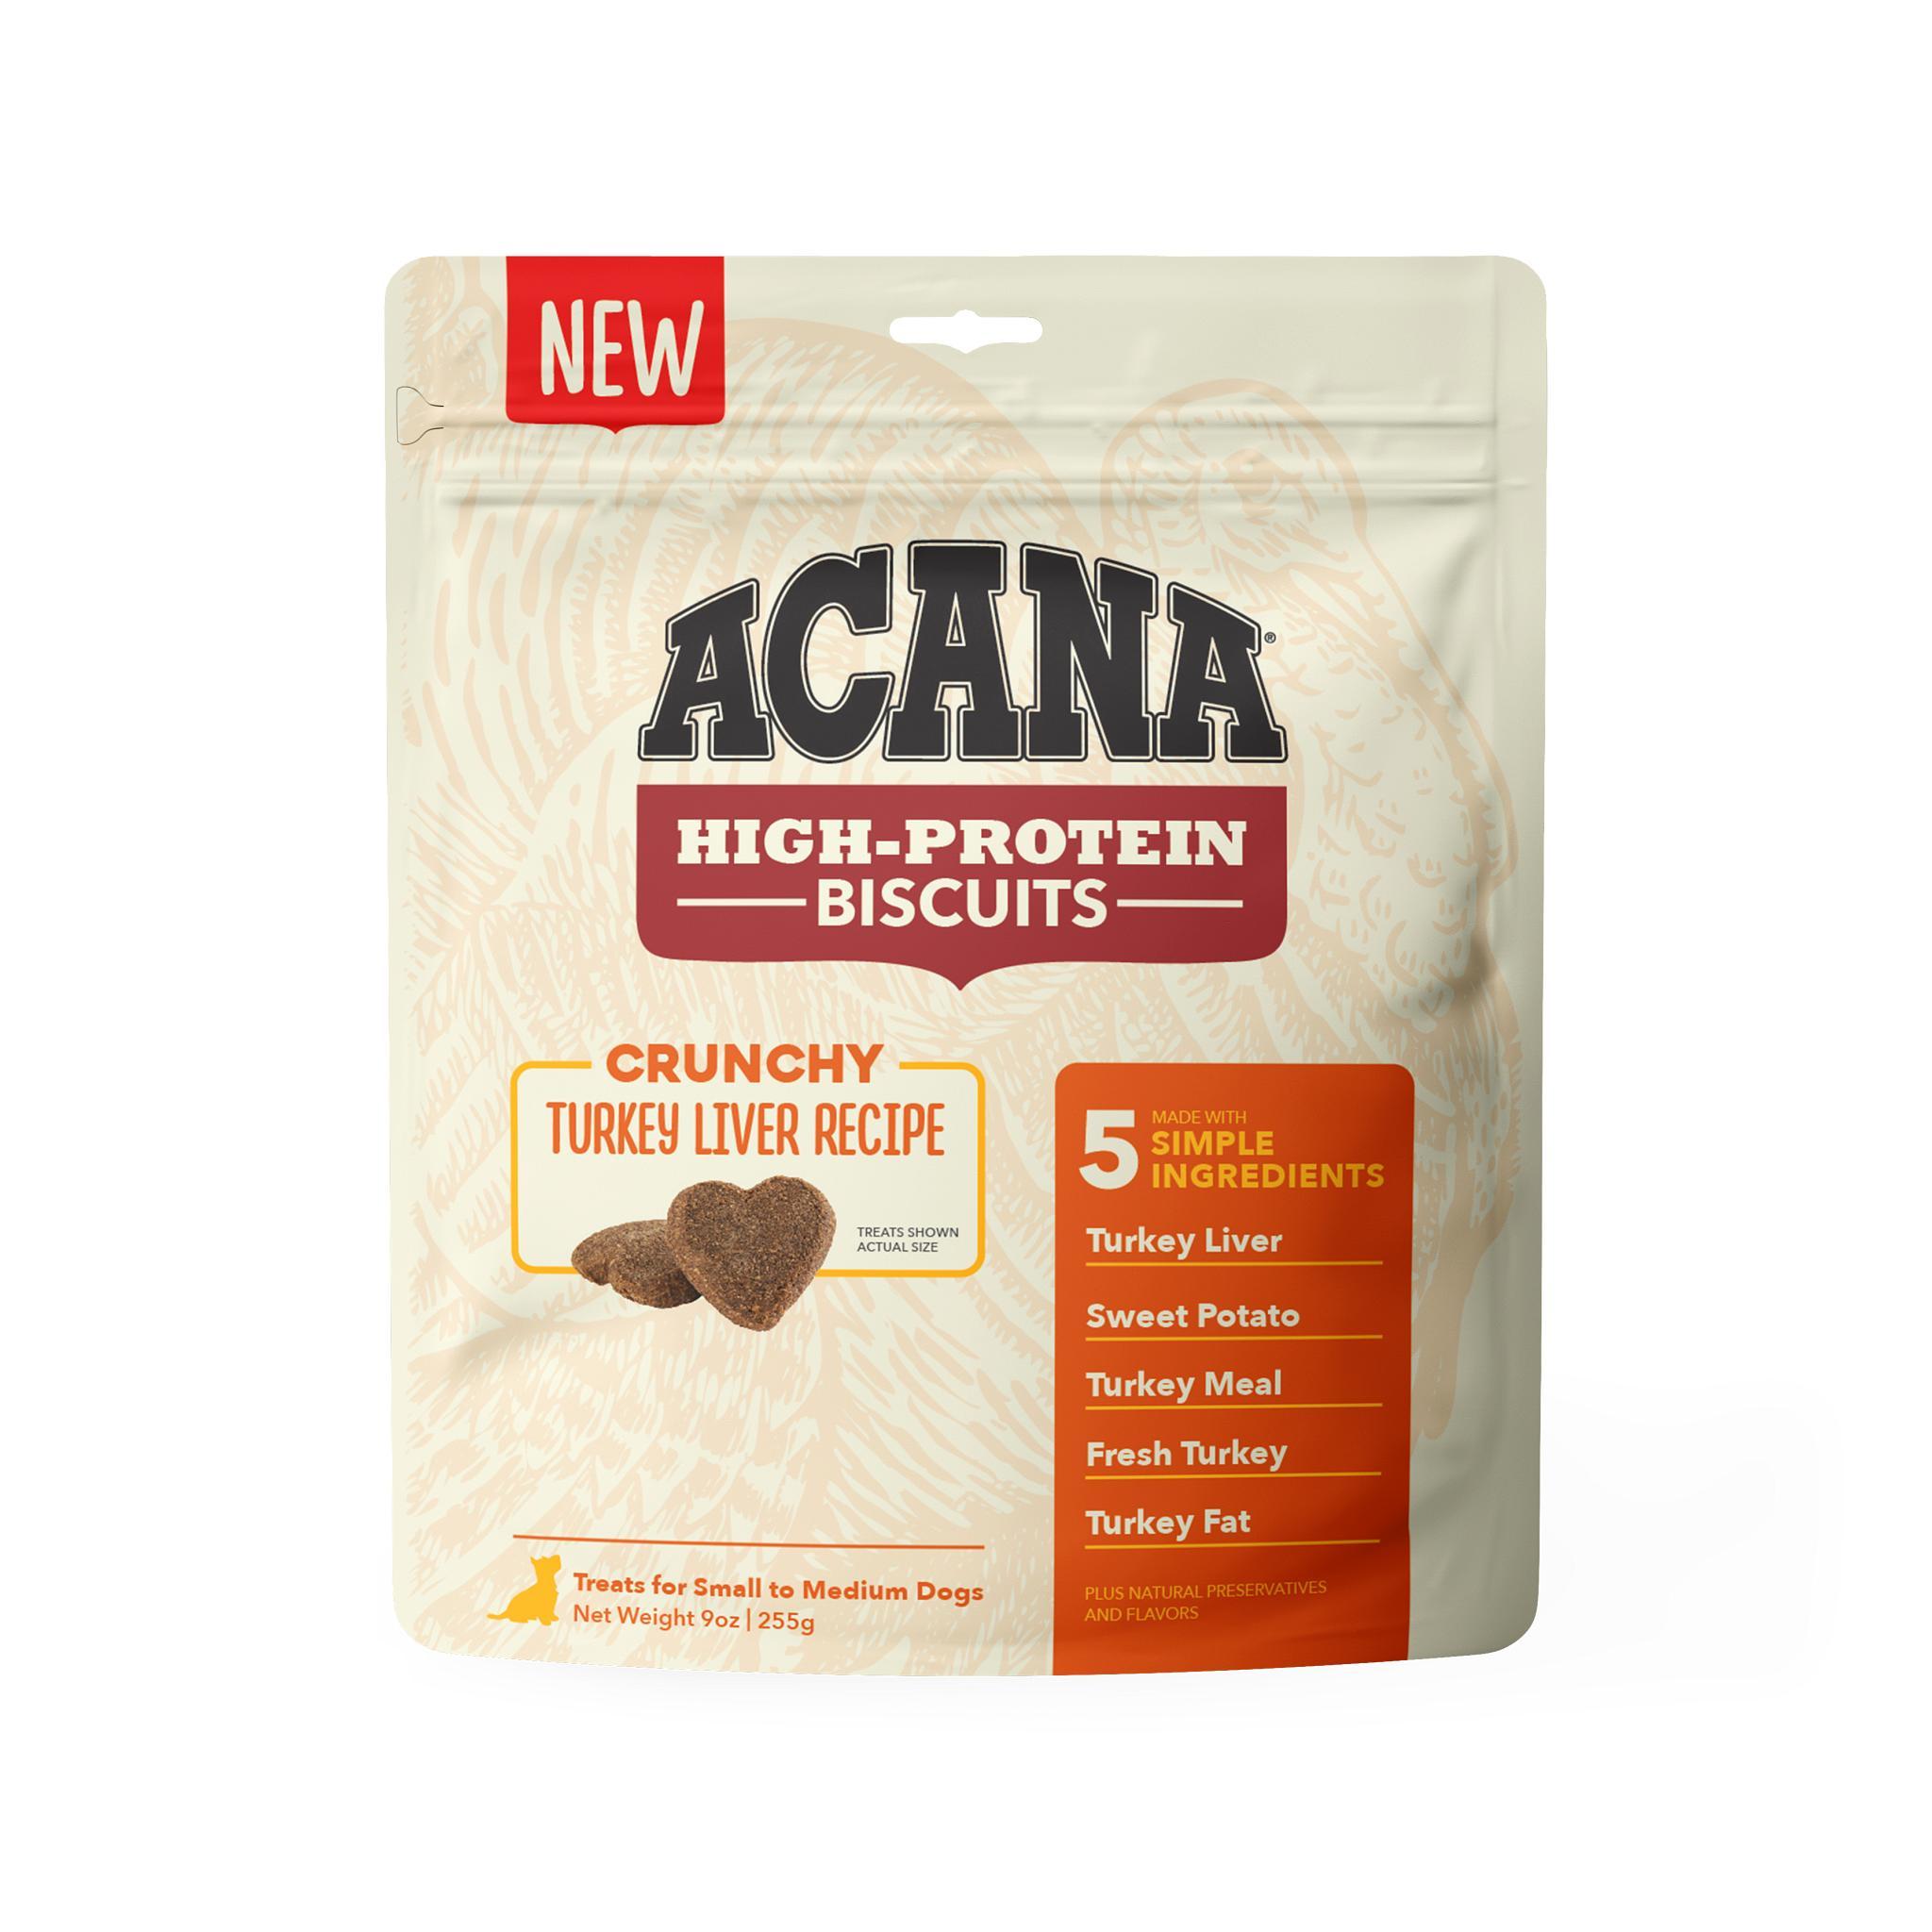 ACANA Crunchy Biscuits Turkey Liver Recipe Dog Treats, Small